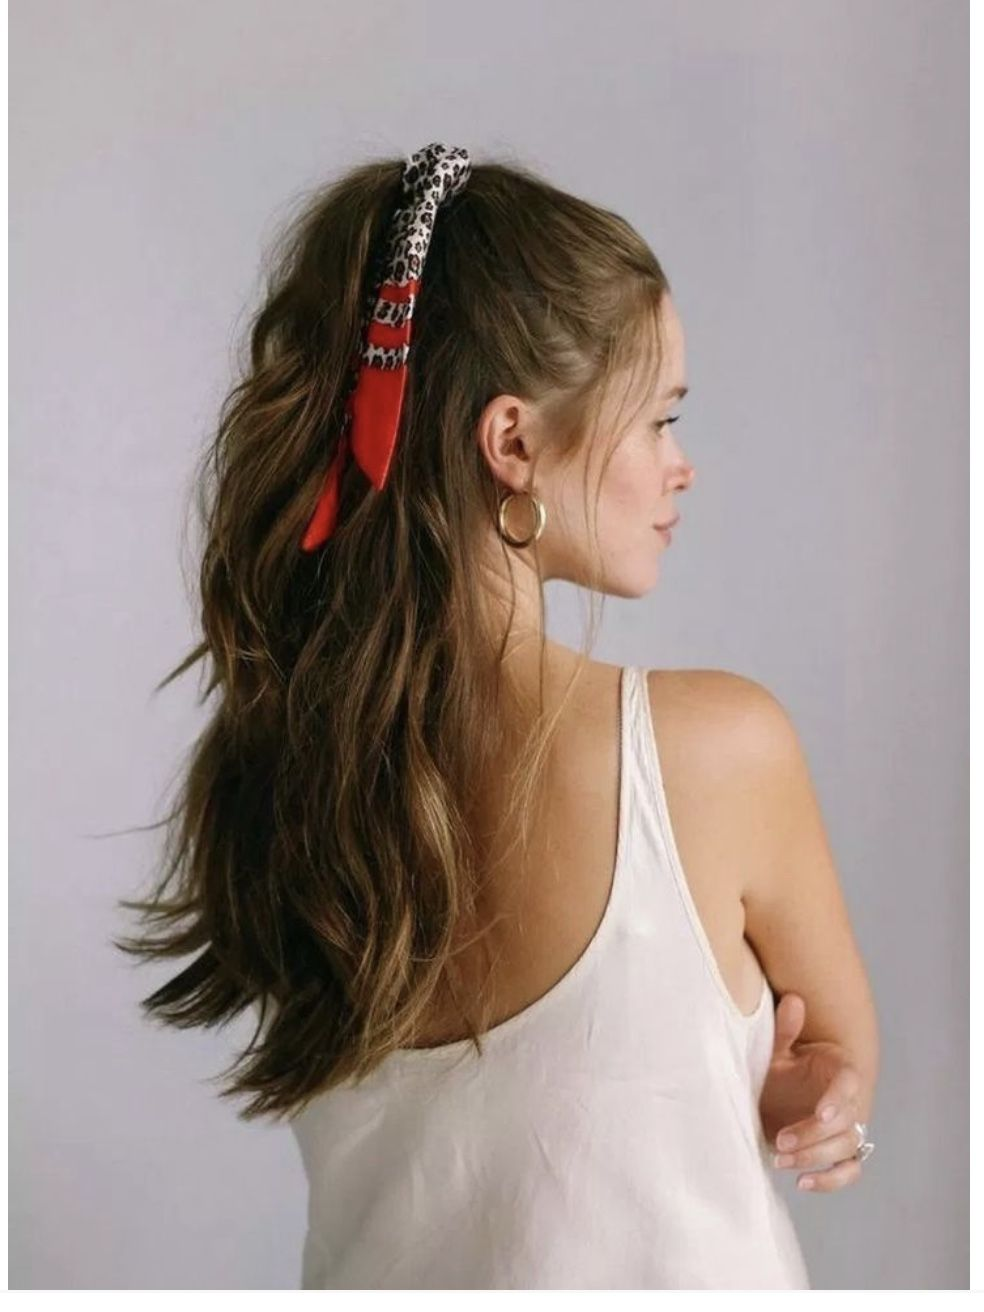 Pin By Paula Lopez On Tips Belleza In 2020 Hair Tutorials Easy Hair Styles Hair Tutorial